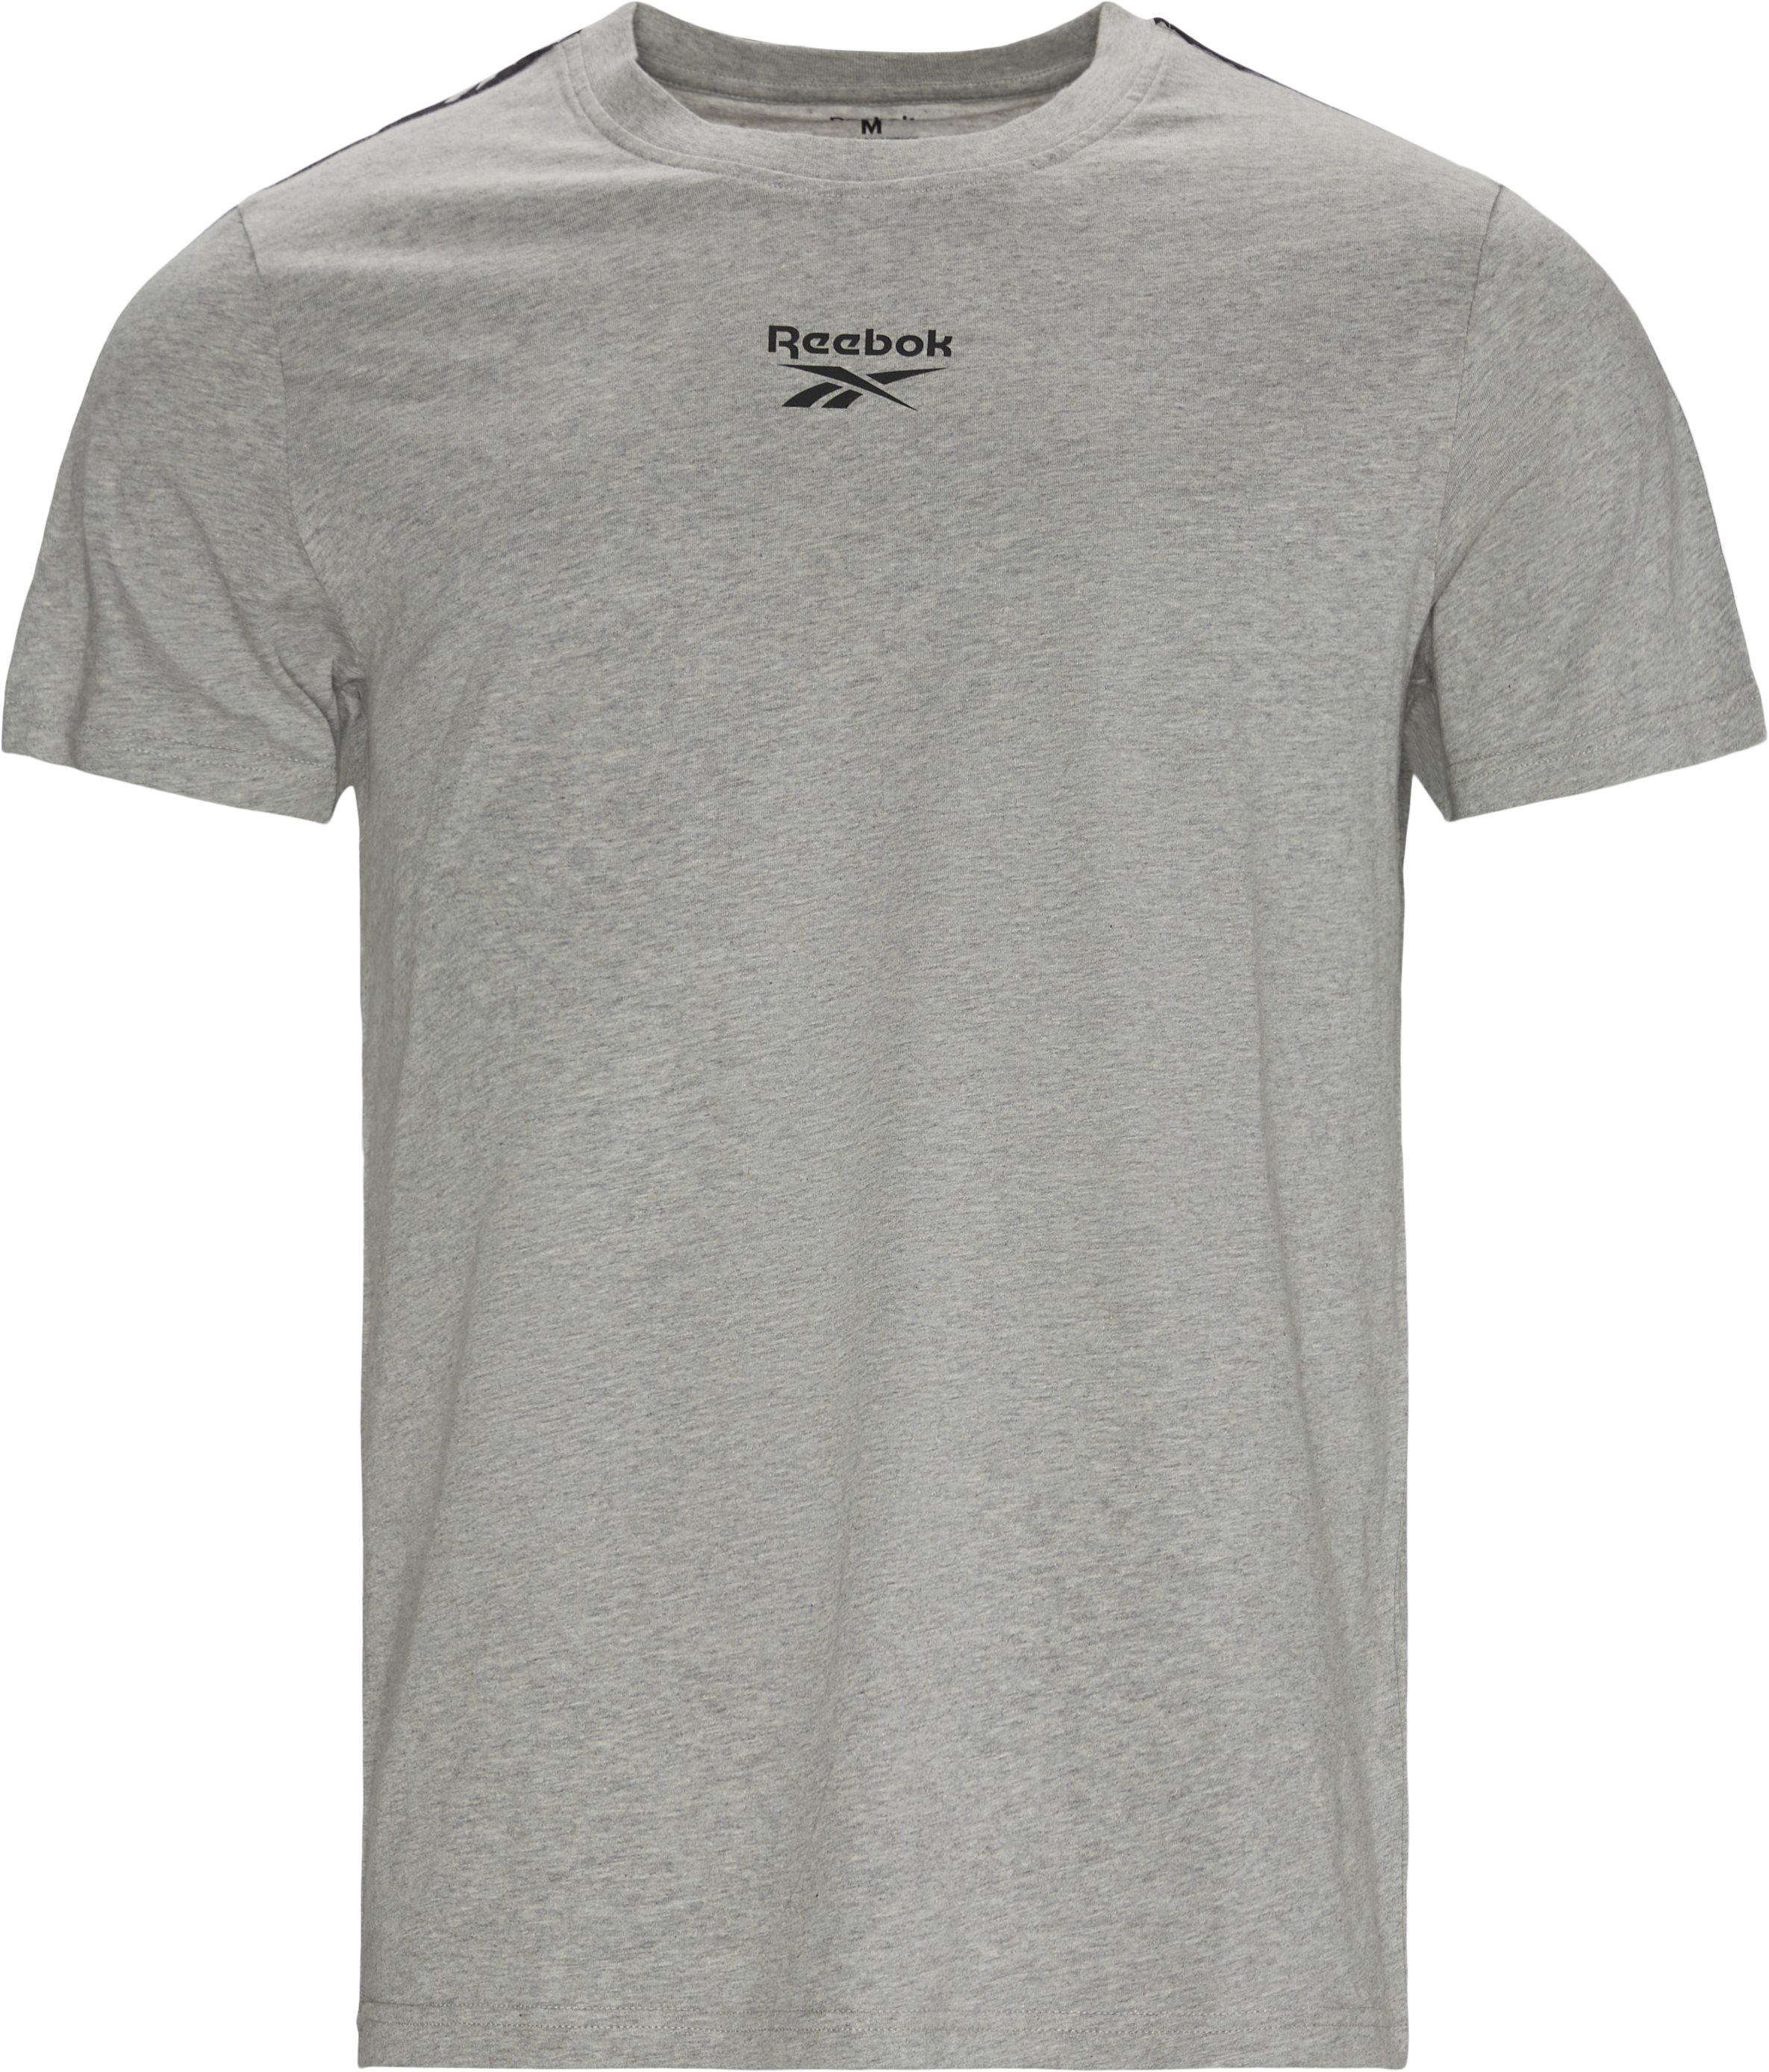 Te Tape Tee - T-shirts - Regular - Grå